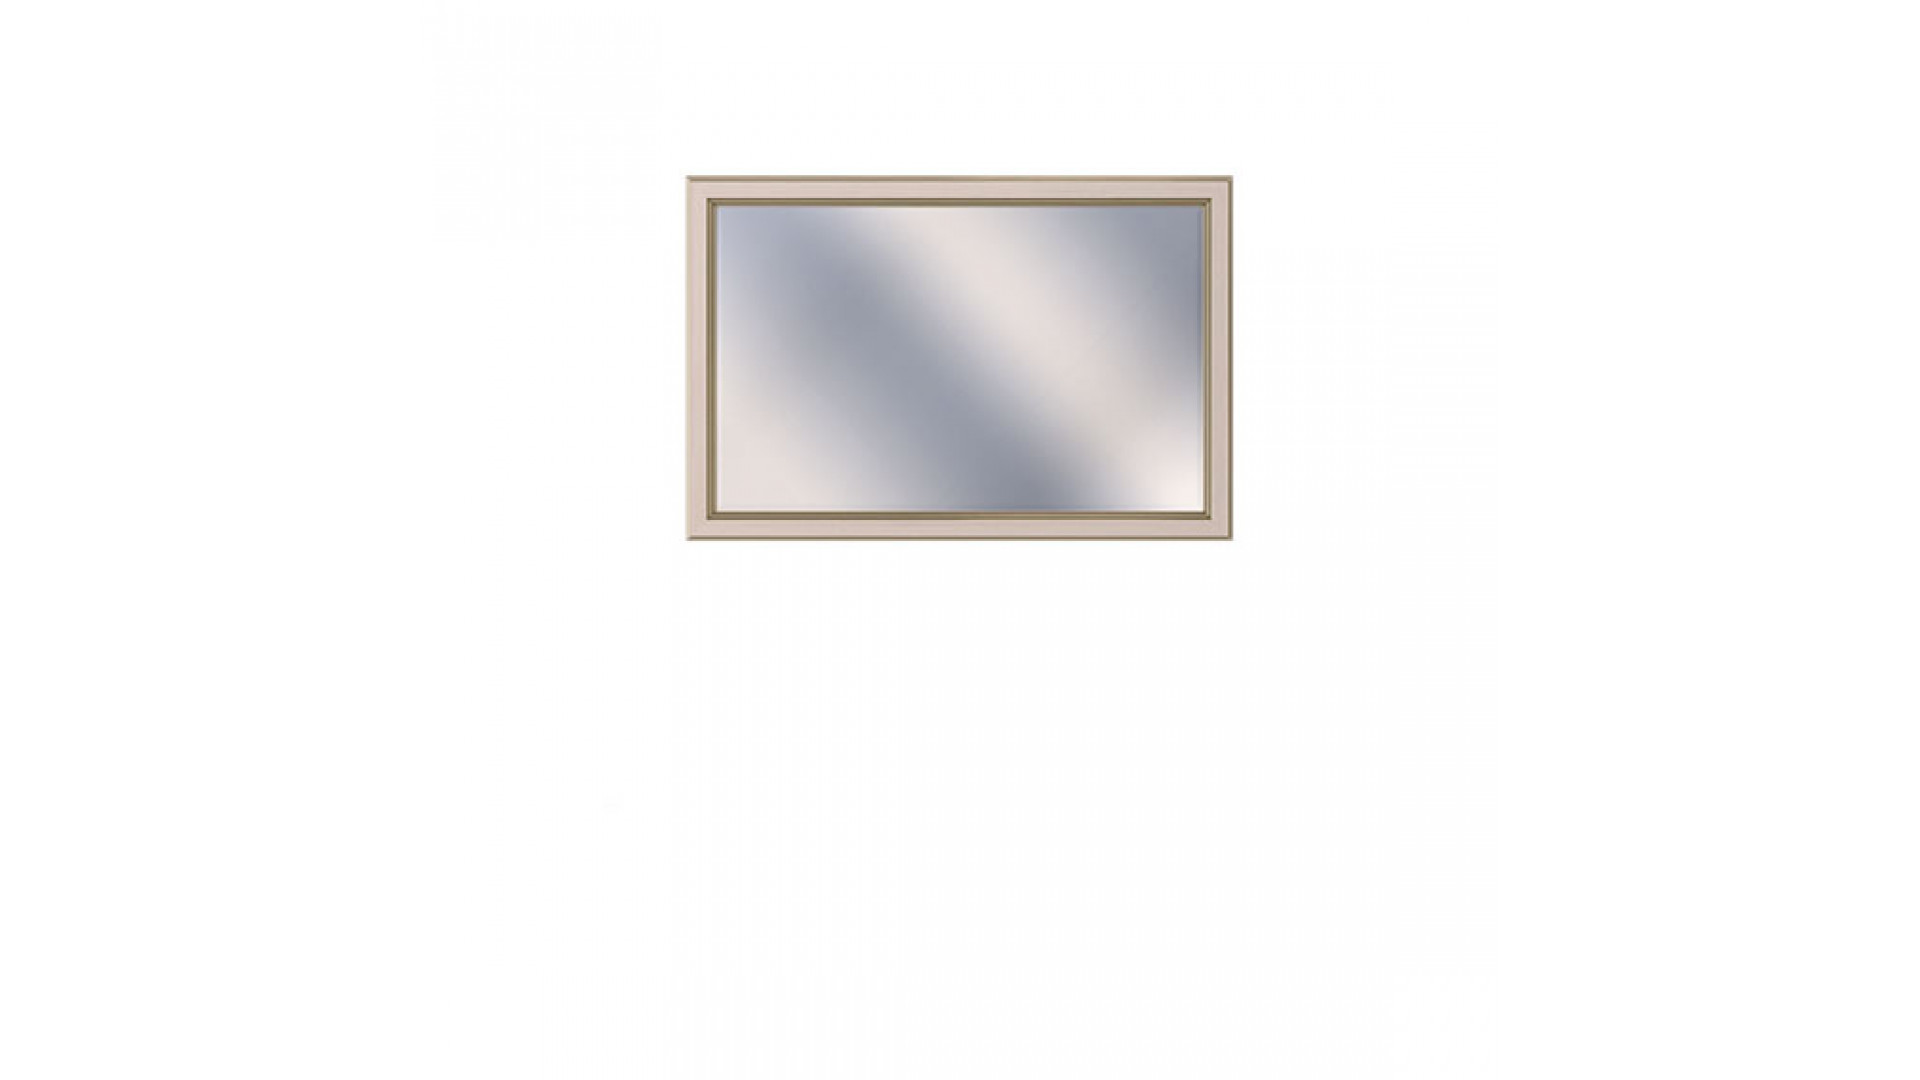 зеркало навесное Кураж Сиена